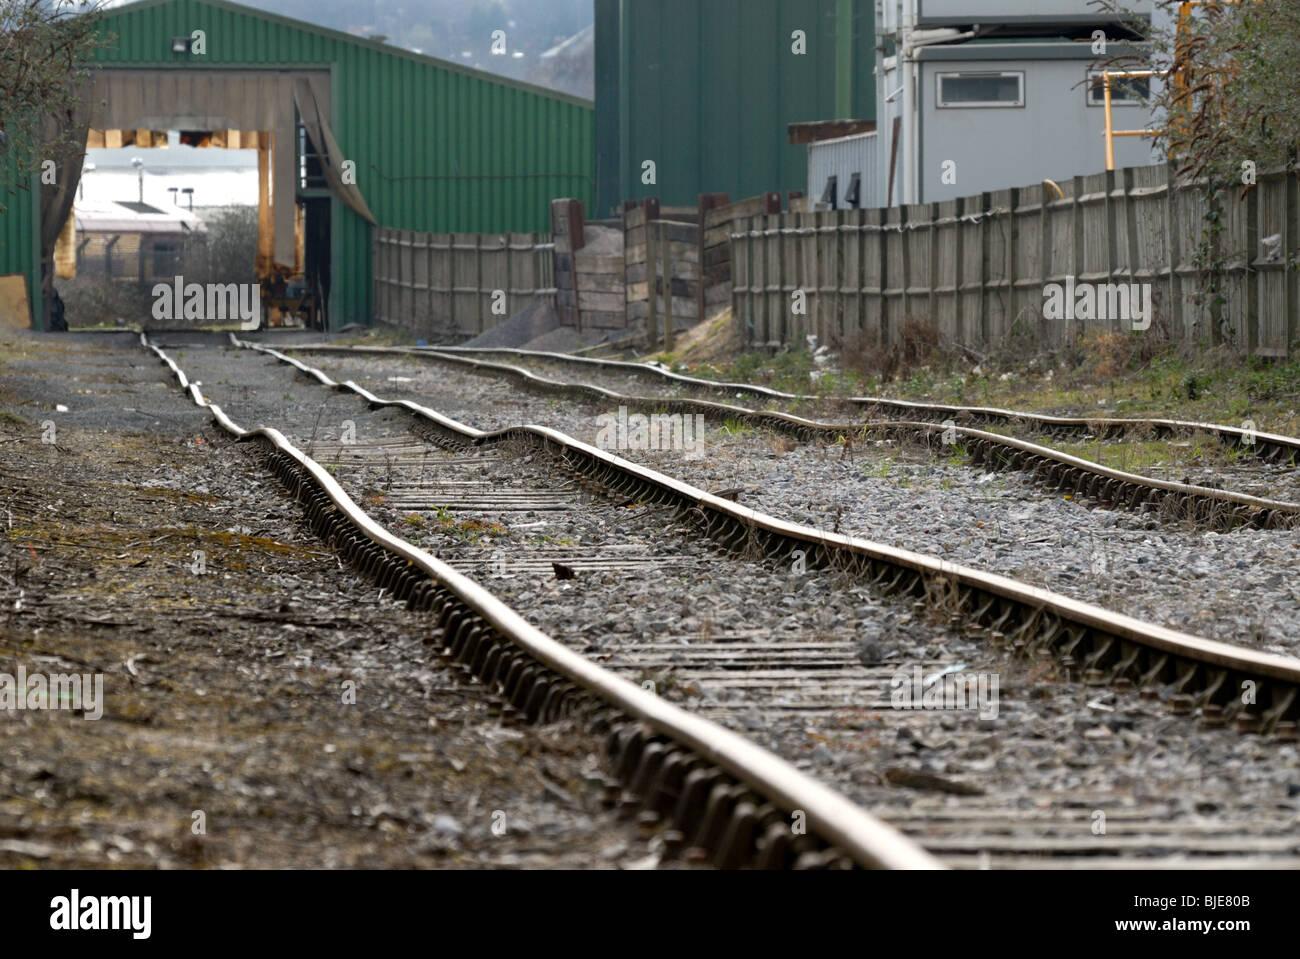 Old railway siding Greenwich London UK - Stock Image